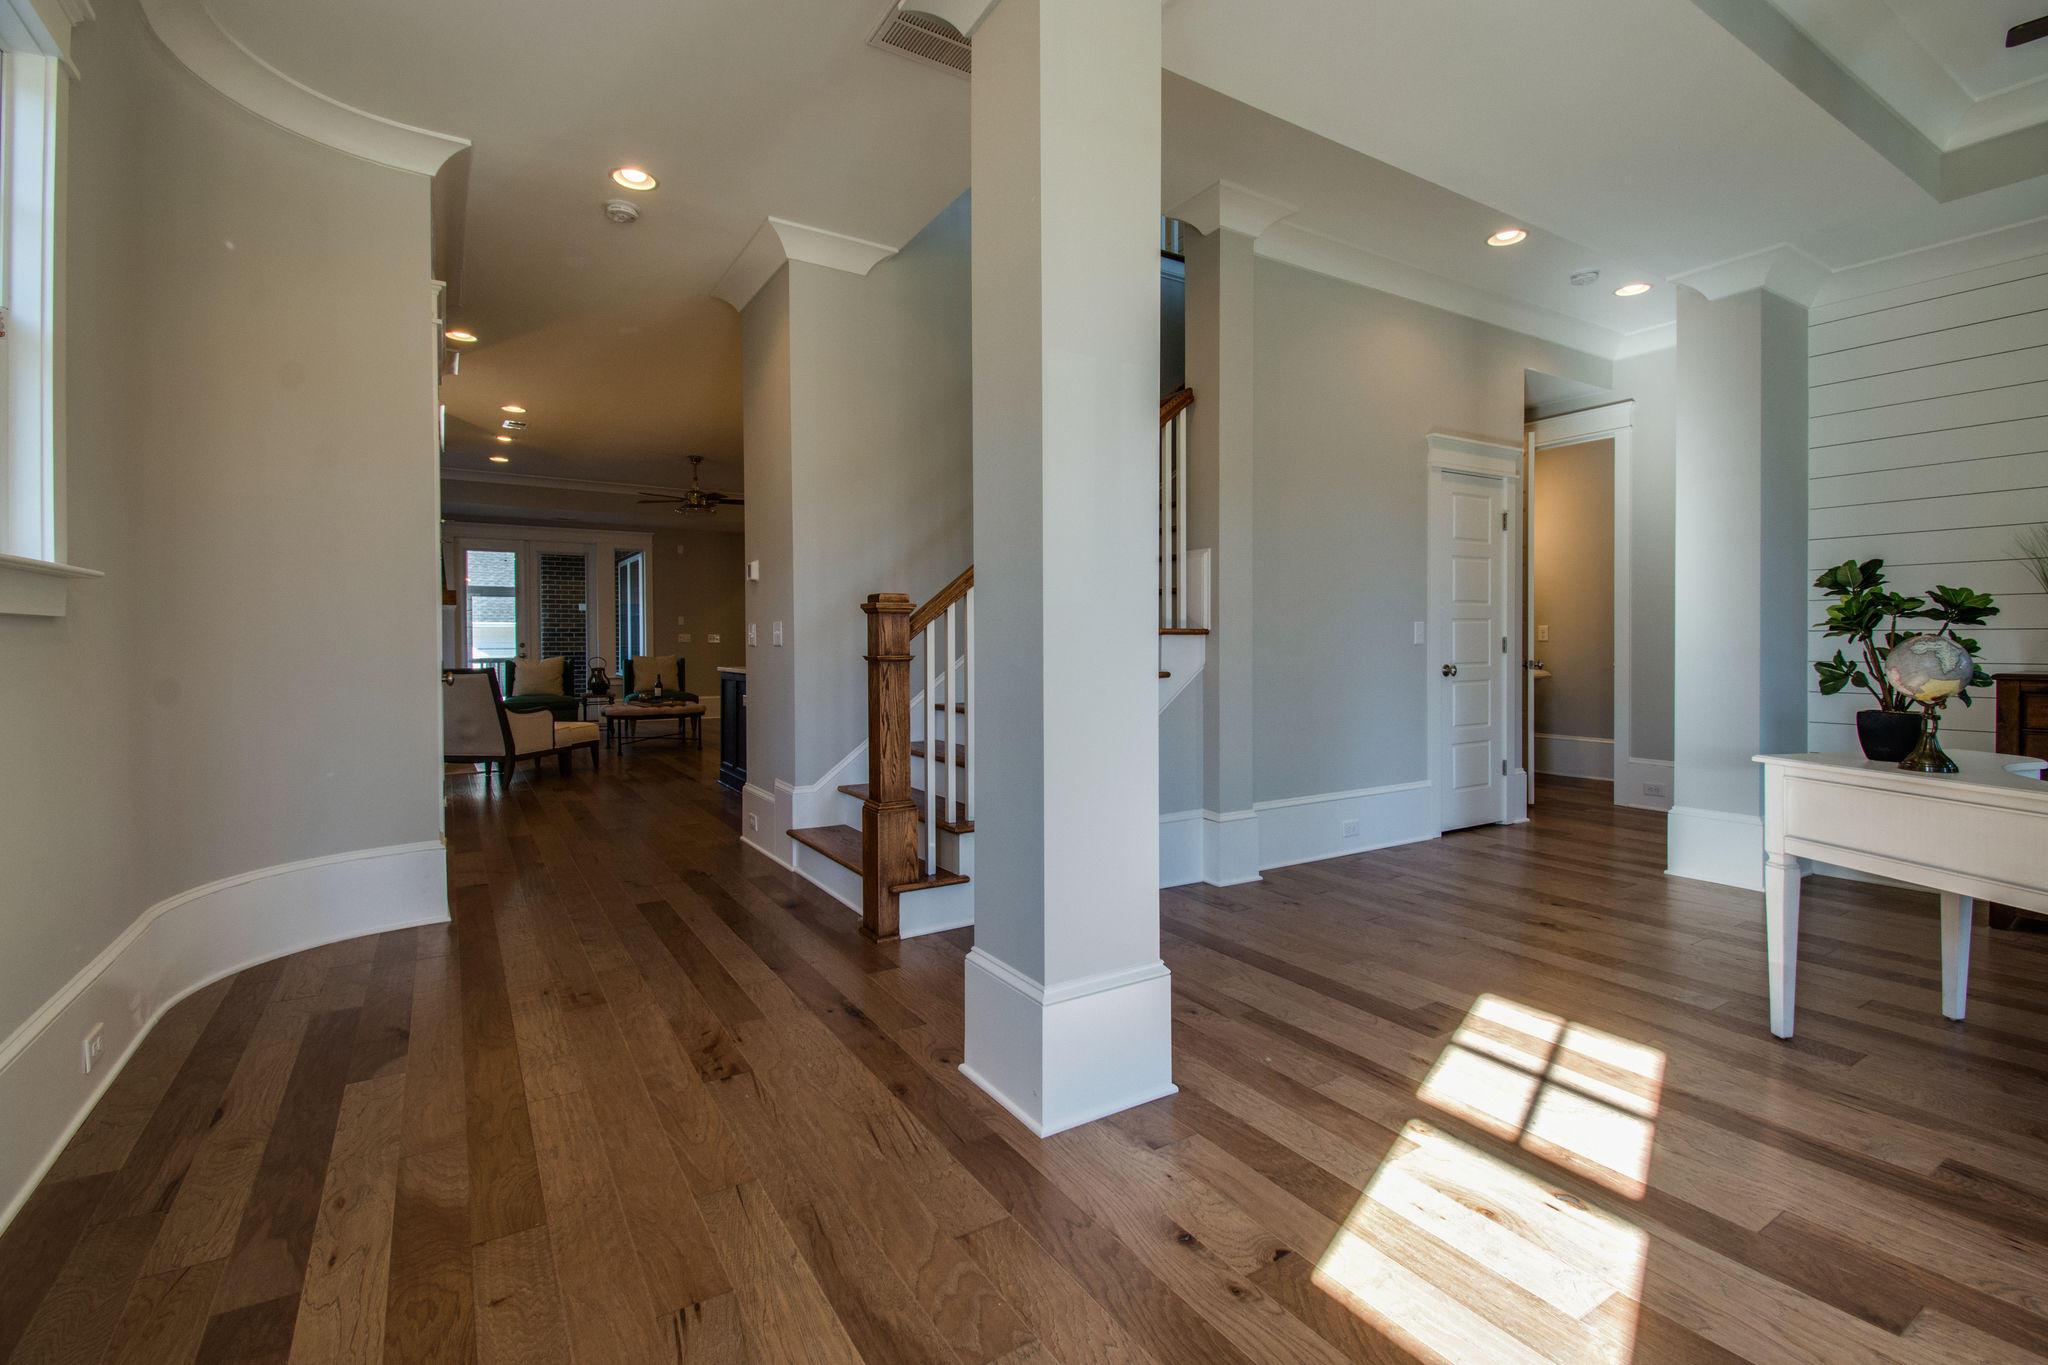 Daniel Island Park Homes For Sale - 112 Brailsford, Charleston, SC - 17